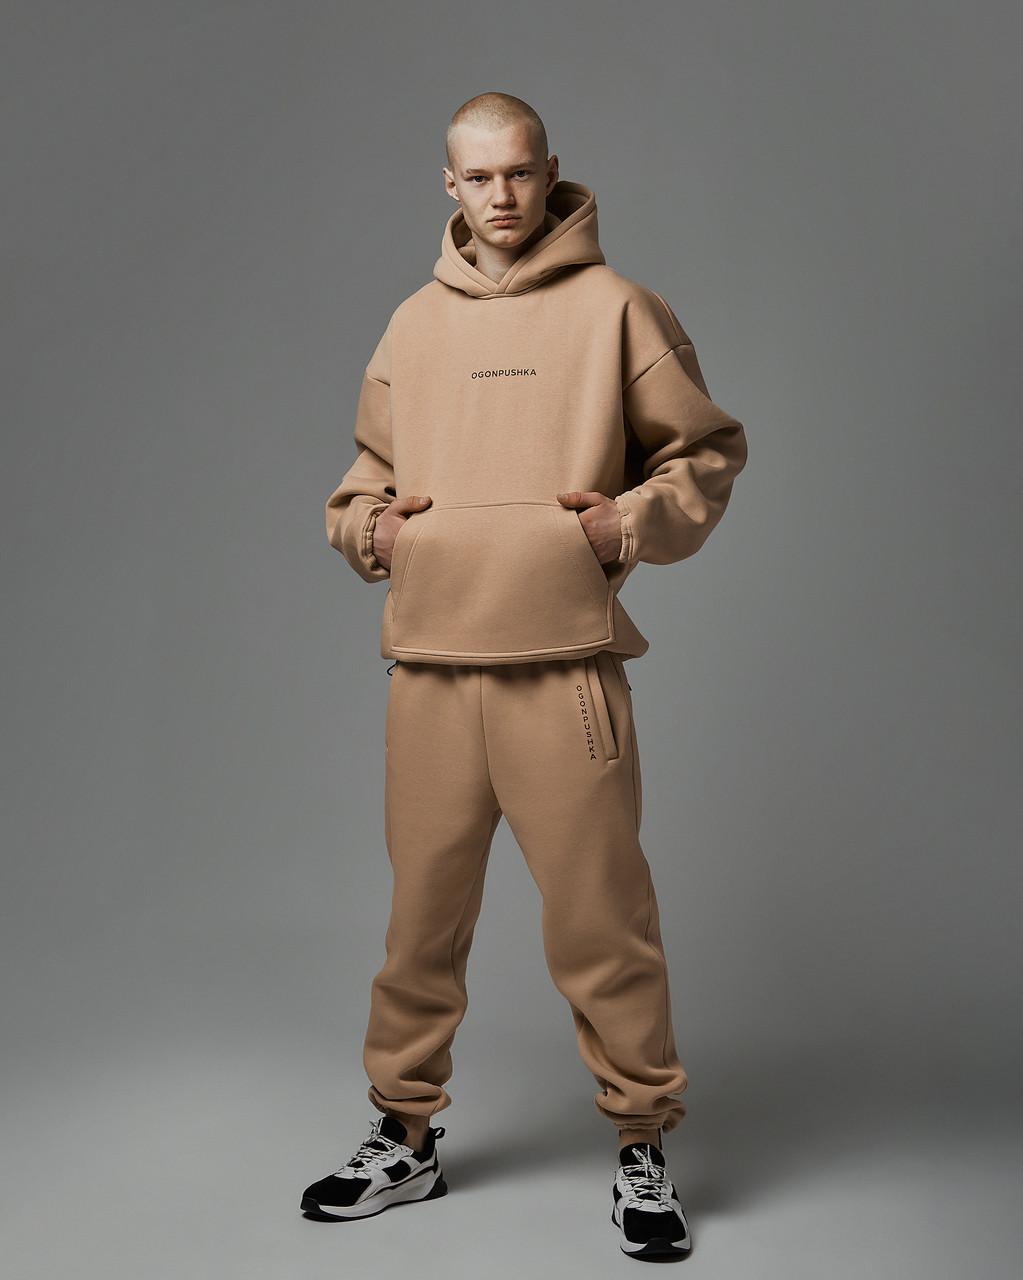 Теплый спортивный костюм оверсайз Пушка Огонь Scale бежевый